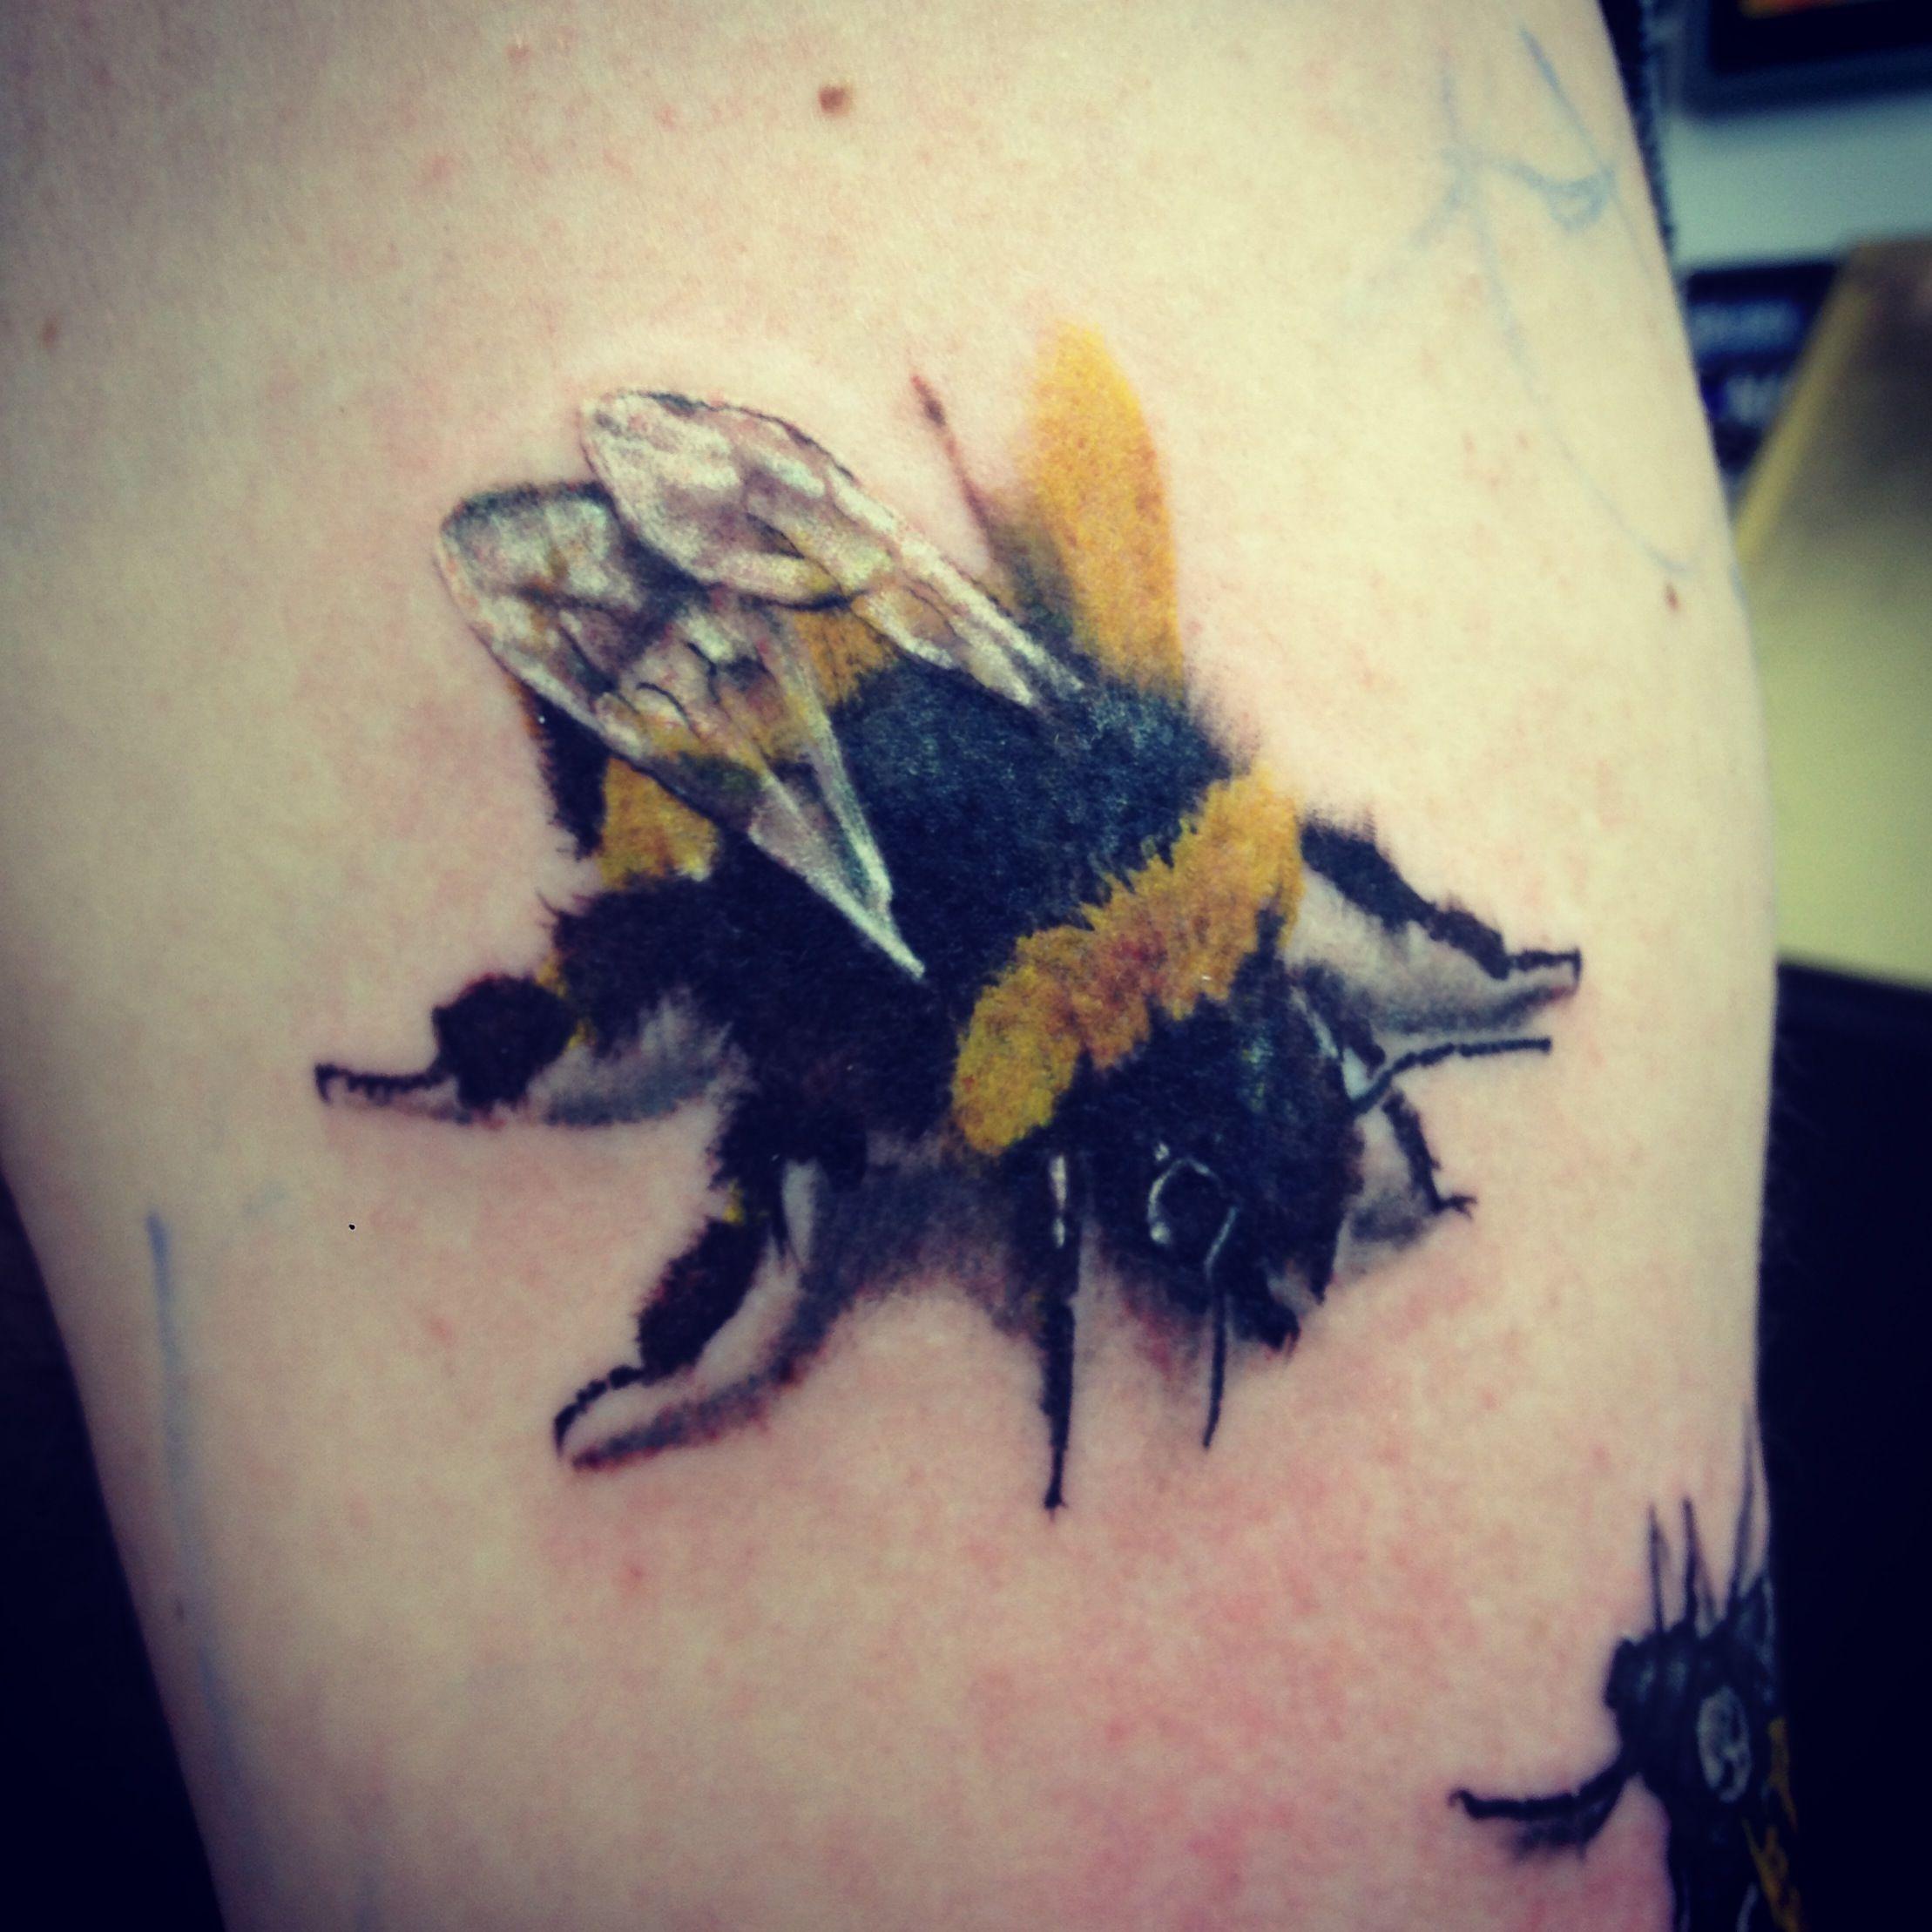 202cdfe0 Bumble bee tattoo | Tattoos | Bee tattoo meaning, Bug tattoo, Bumble ...